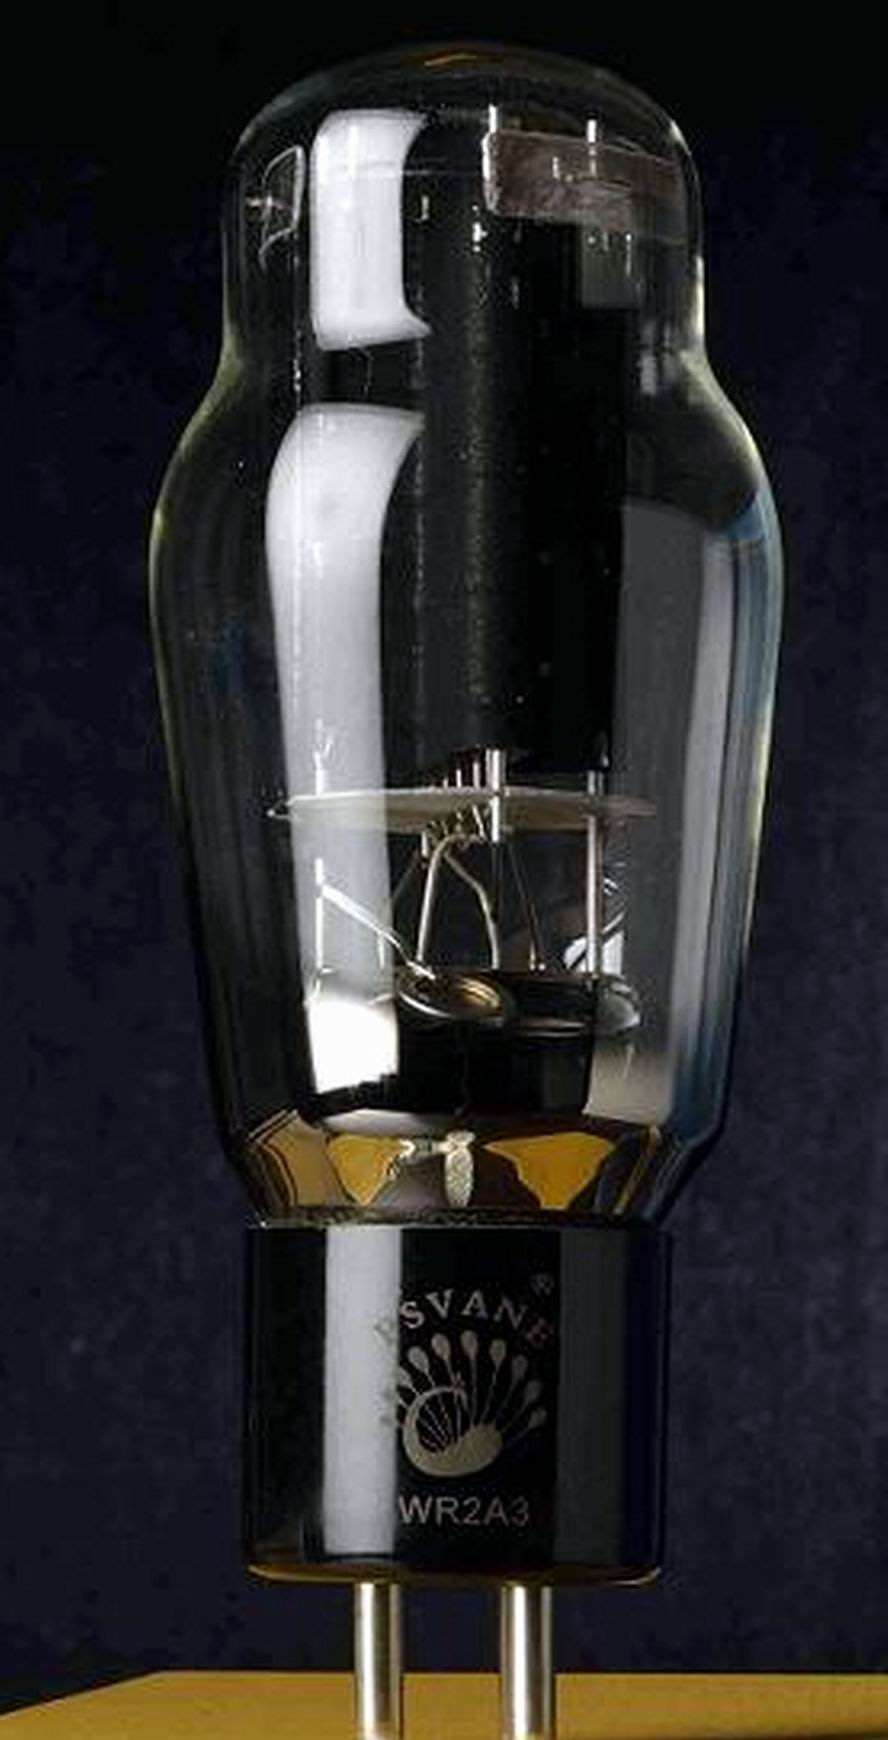 PSVANE 復刻西電WR2A3真空管Vacuum Tube(2A3 2A3B 2A3C)